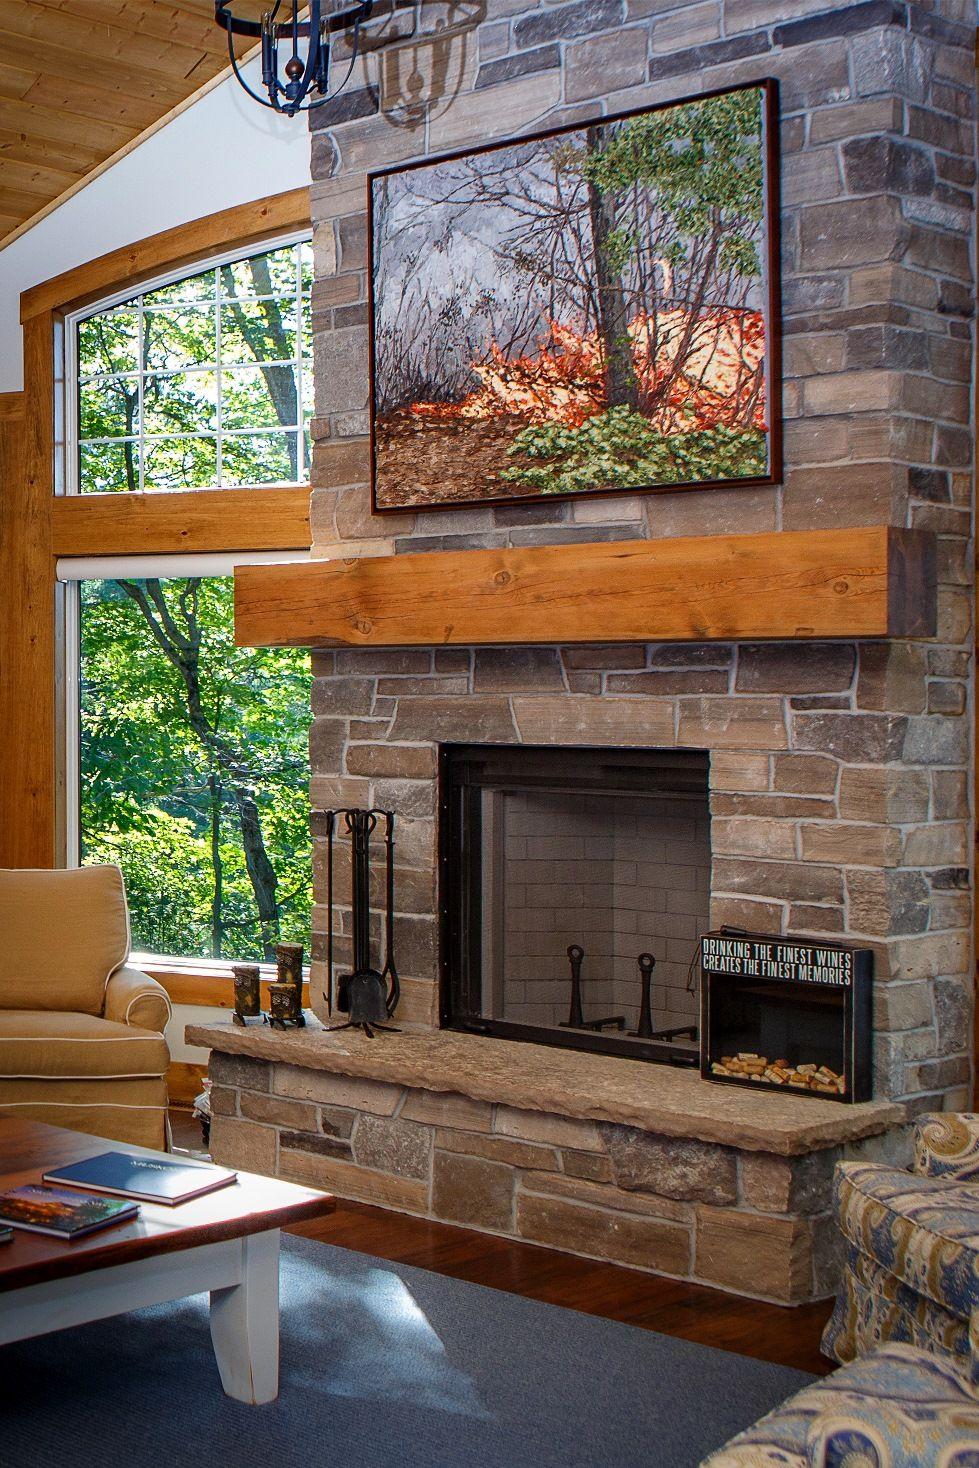 seguin cottage custom stone fireplace interior cottage living parry sound muskoka. Black Bedroom Furniture Sets. Home Design Ideas